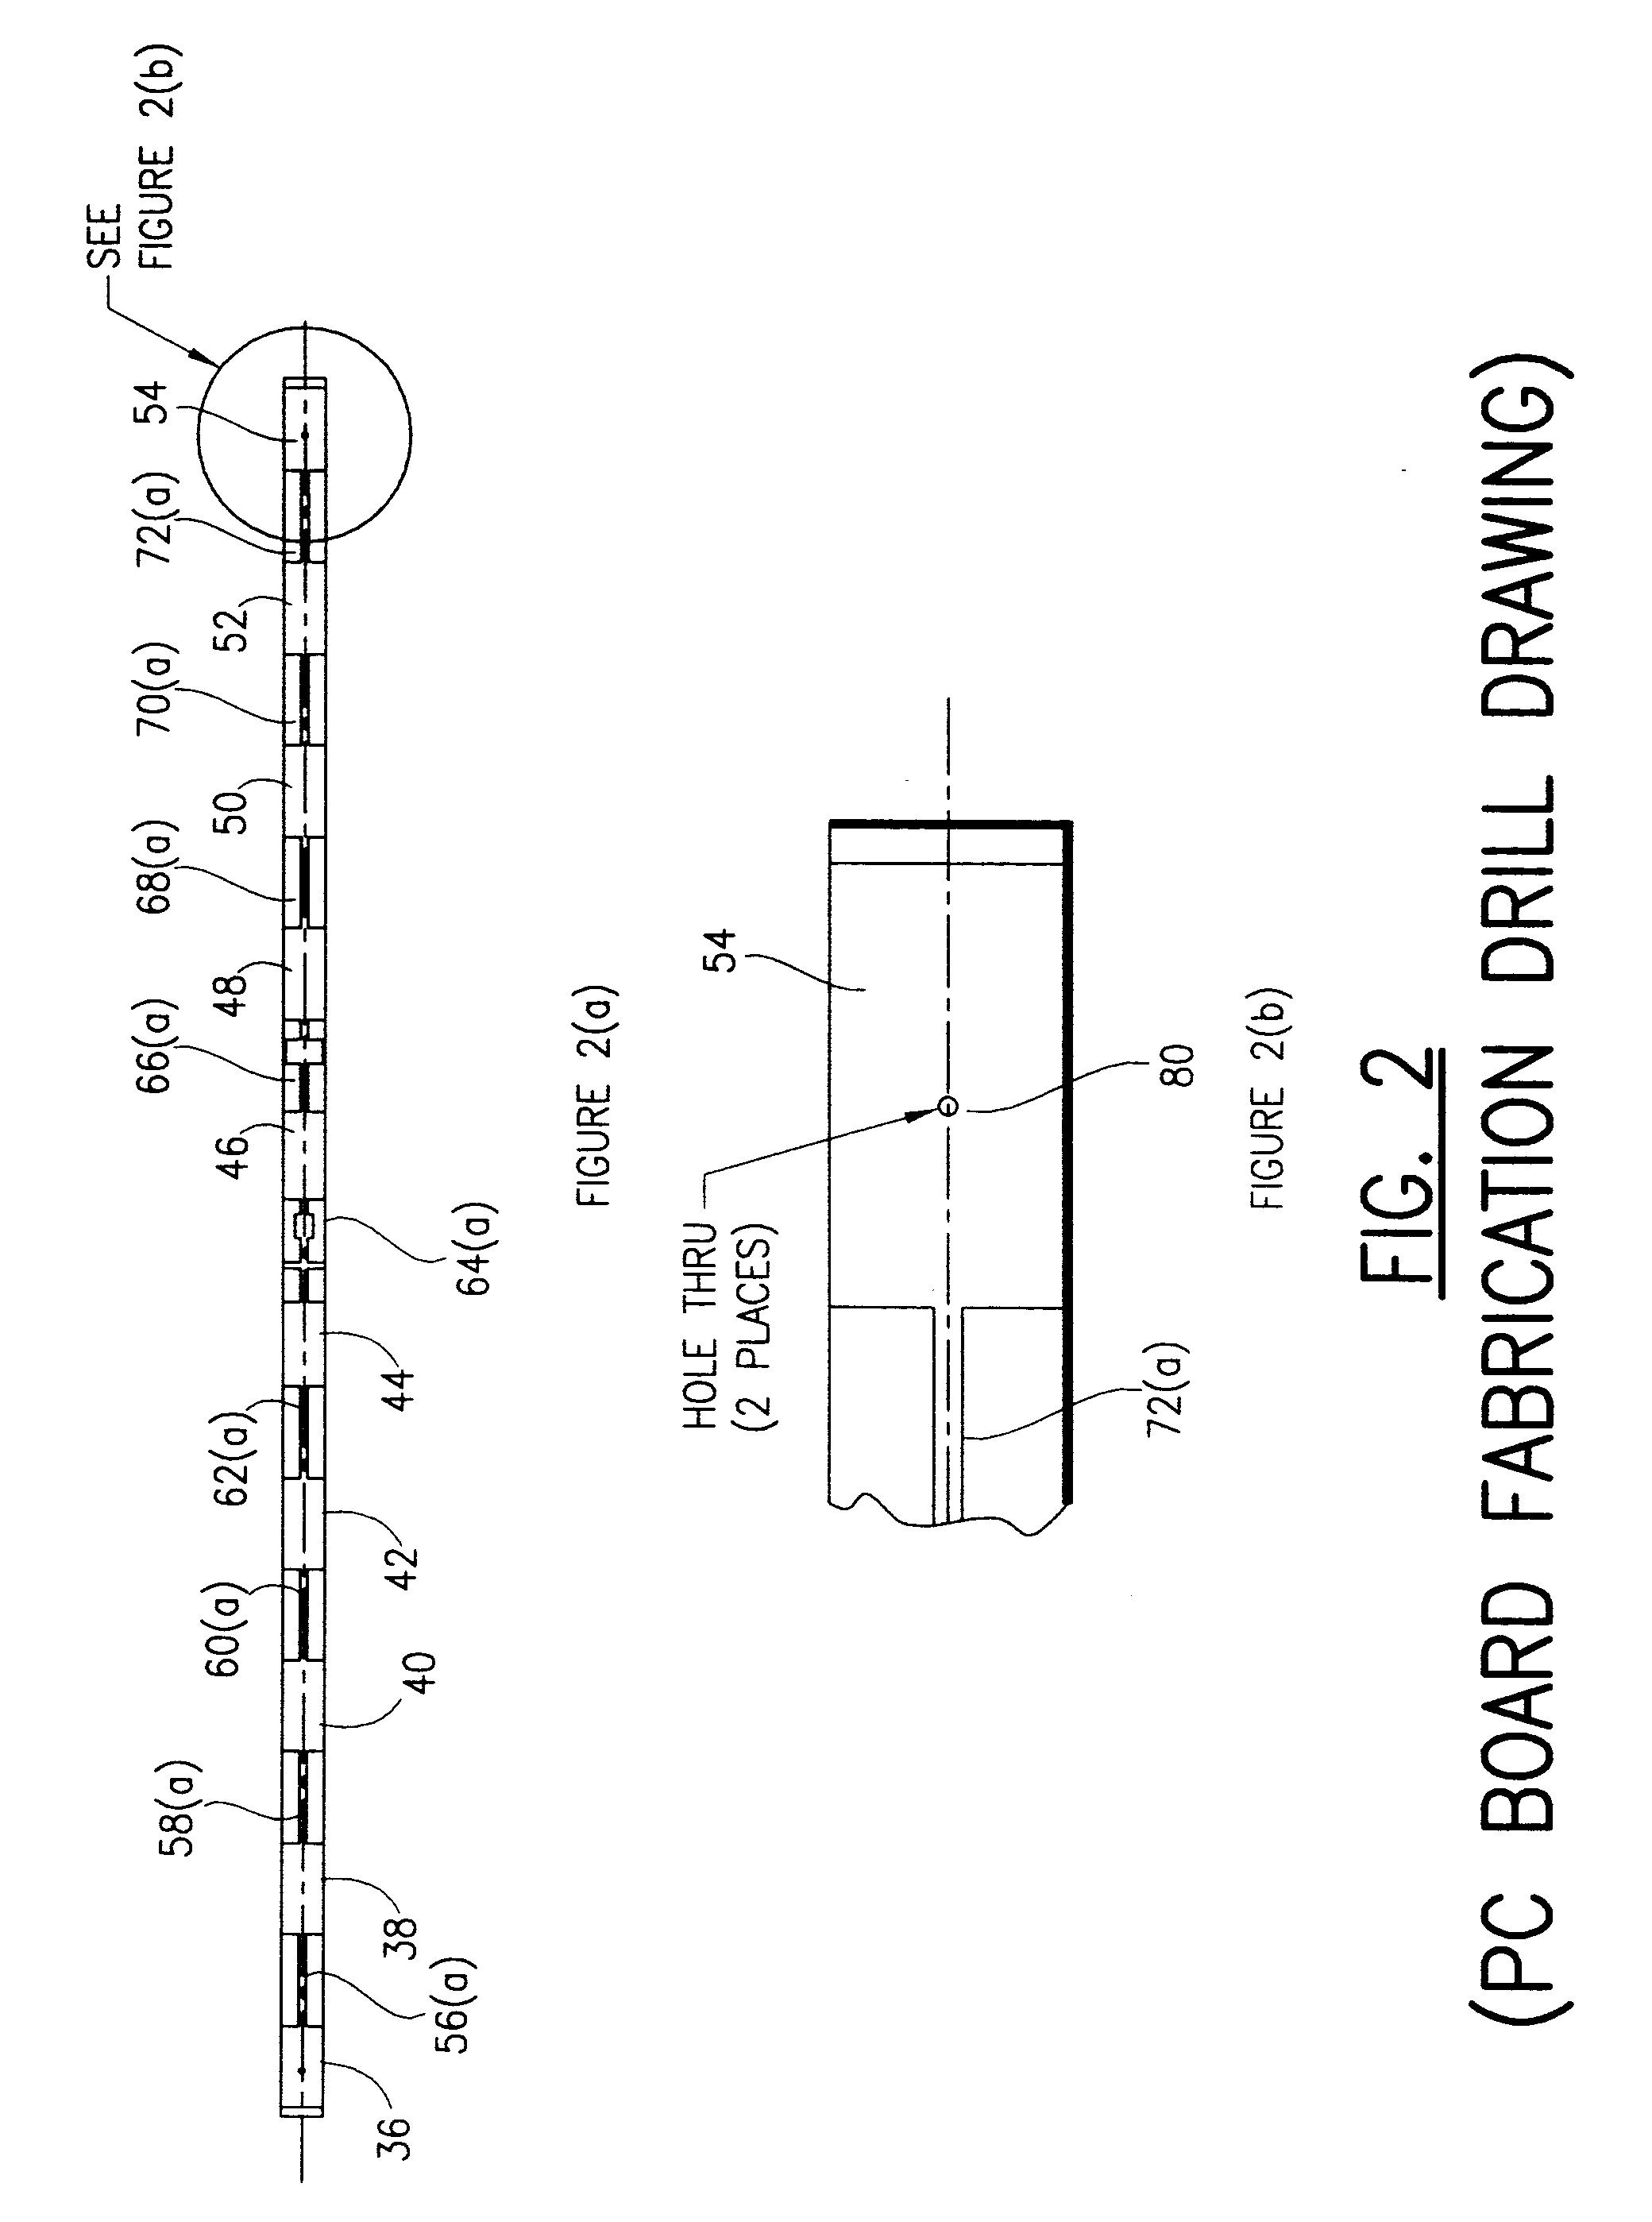 patent ep0855760a2 - microstrip collinear antenna